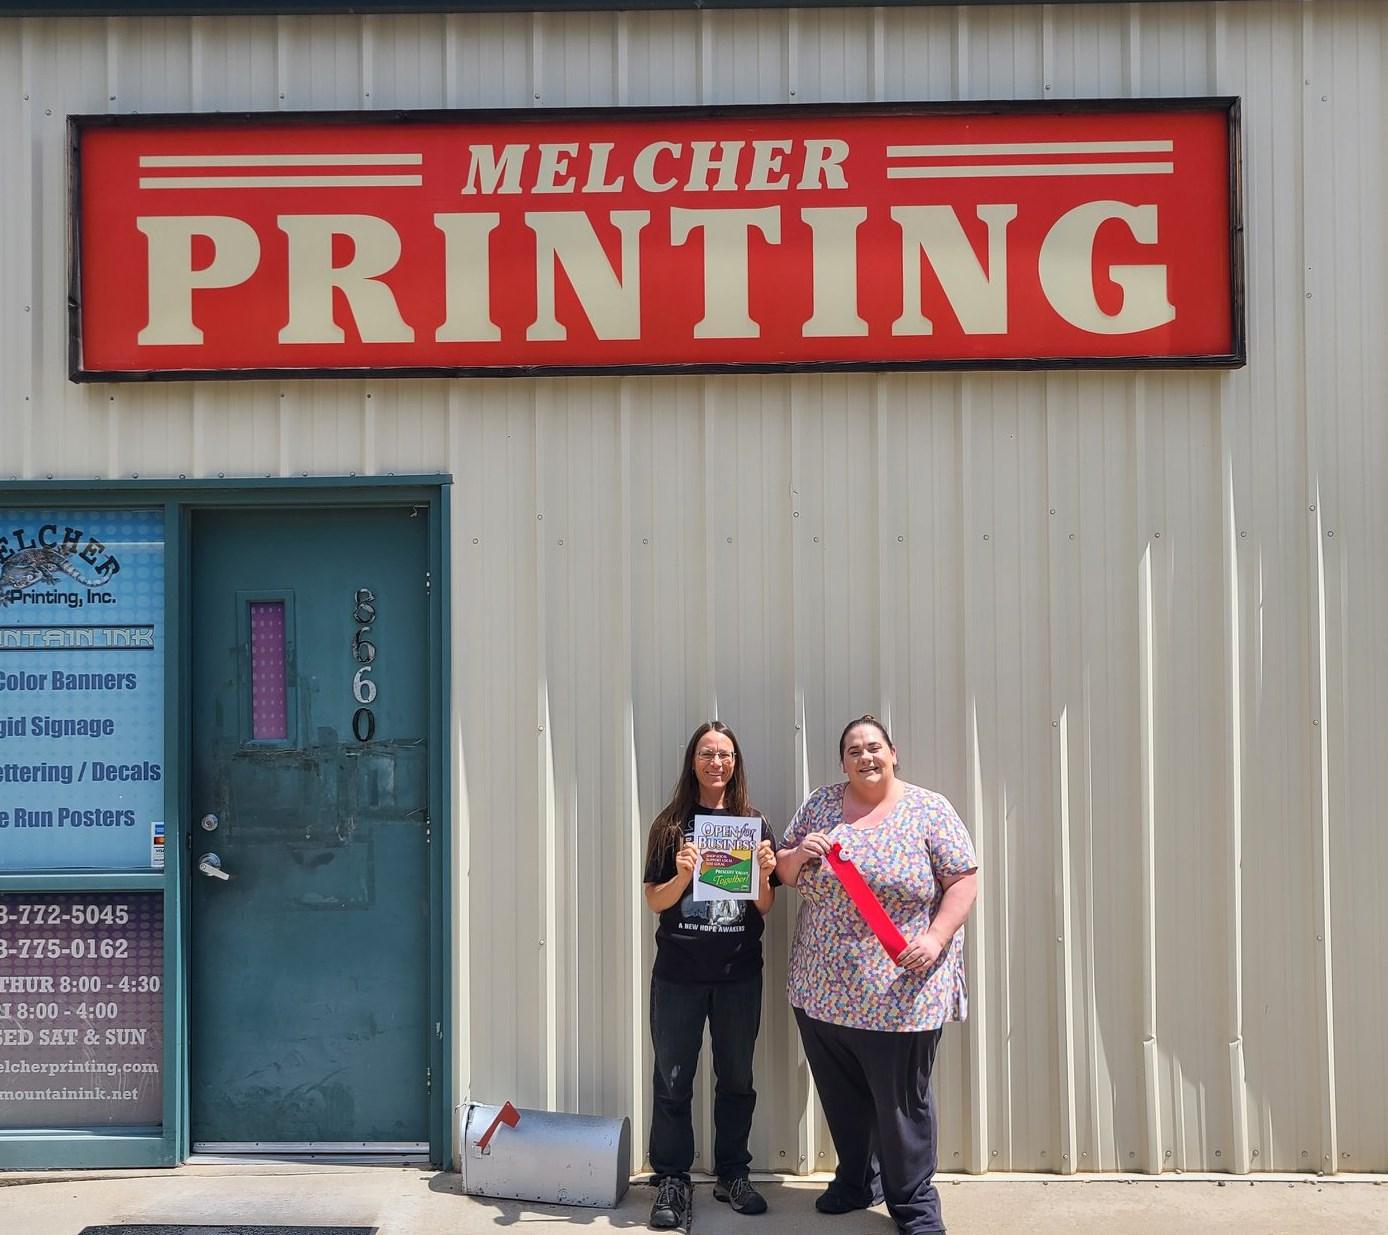 melcher-printing.jpg